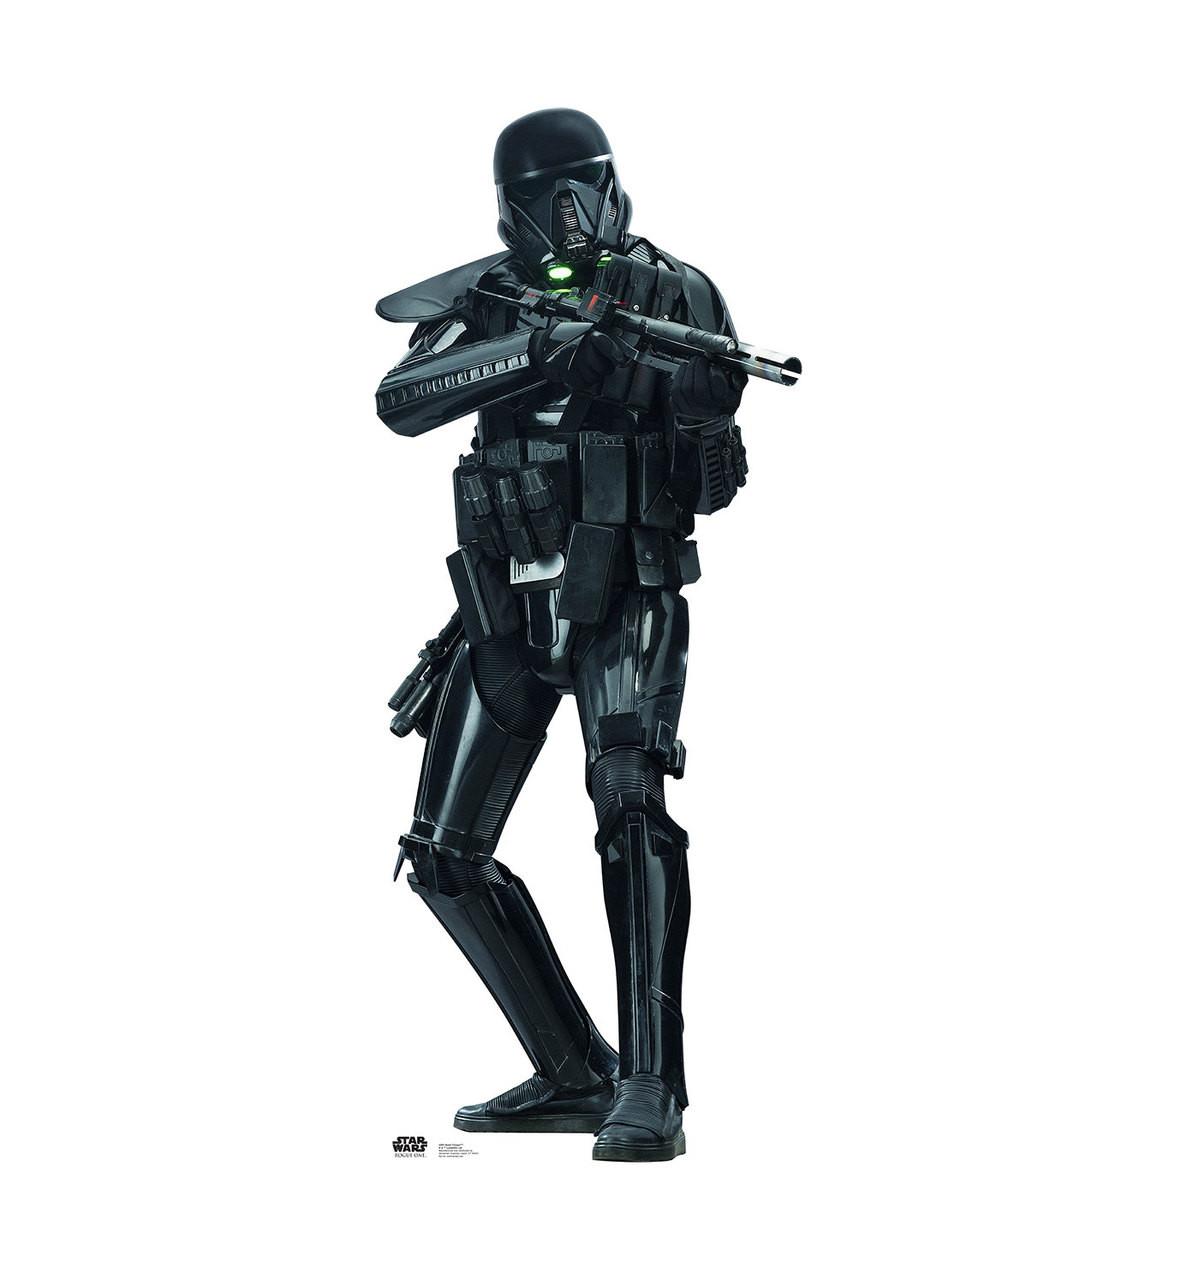 Shoretrooper-Rogue One Cardboard Cutout 2245